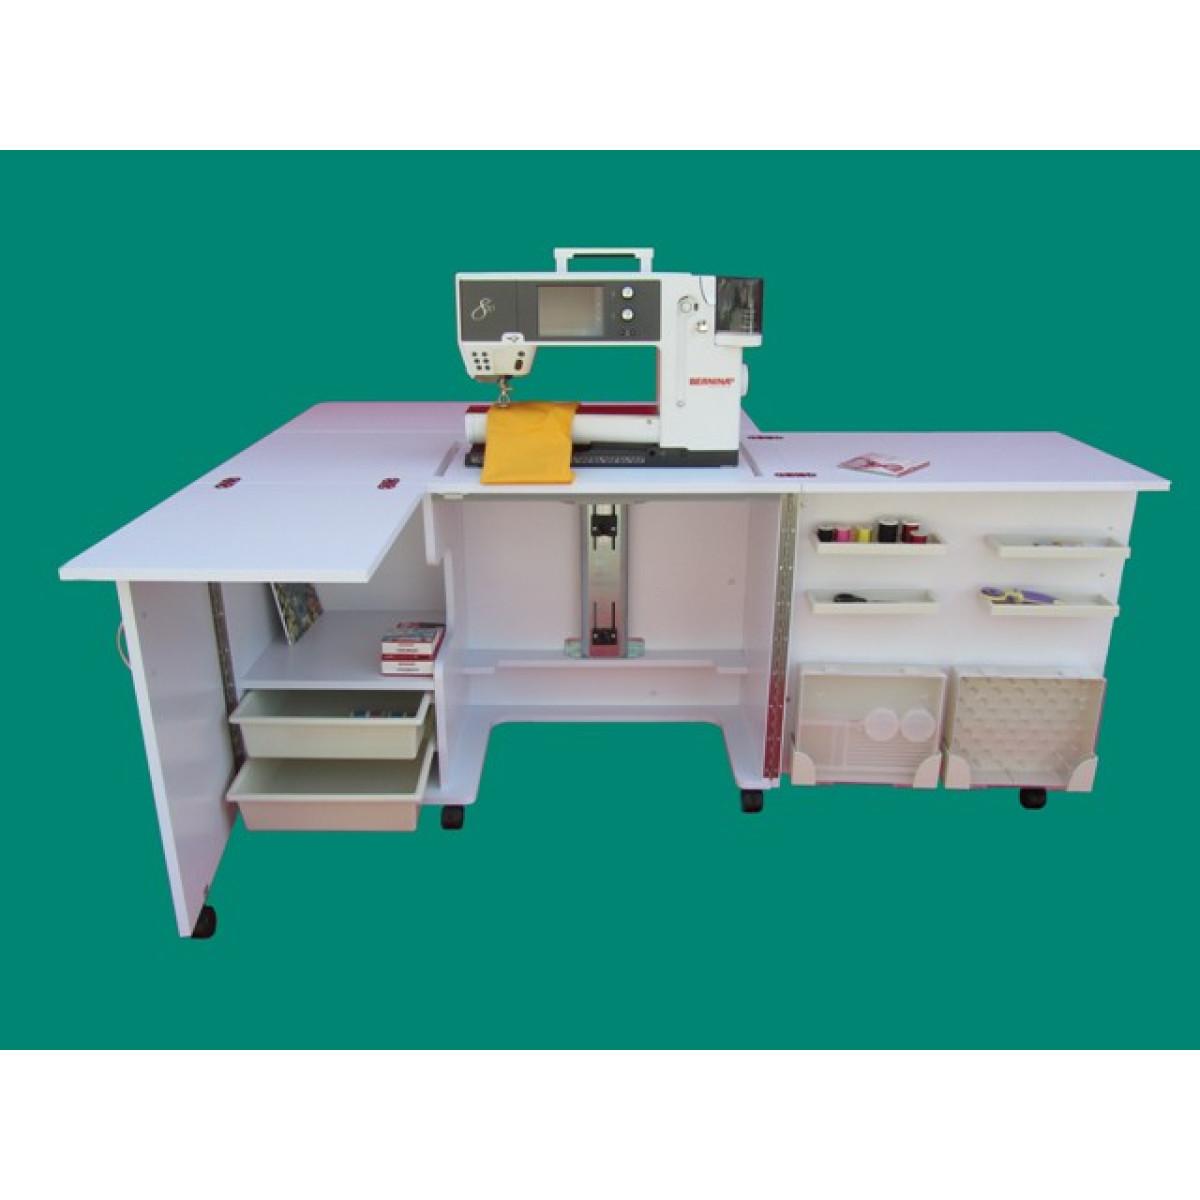 Mobile per macchina da cucire idee immagine mobili - Mobili per macchine da cucire ...